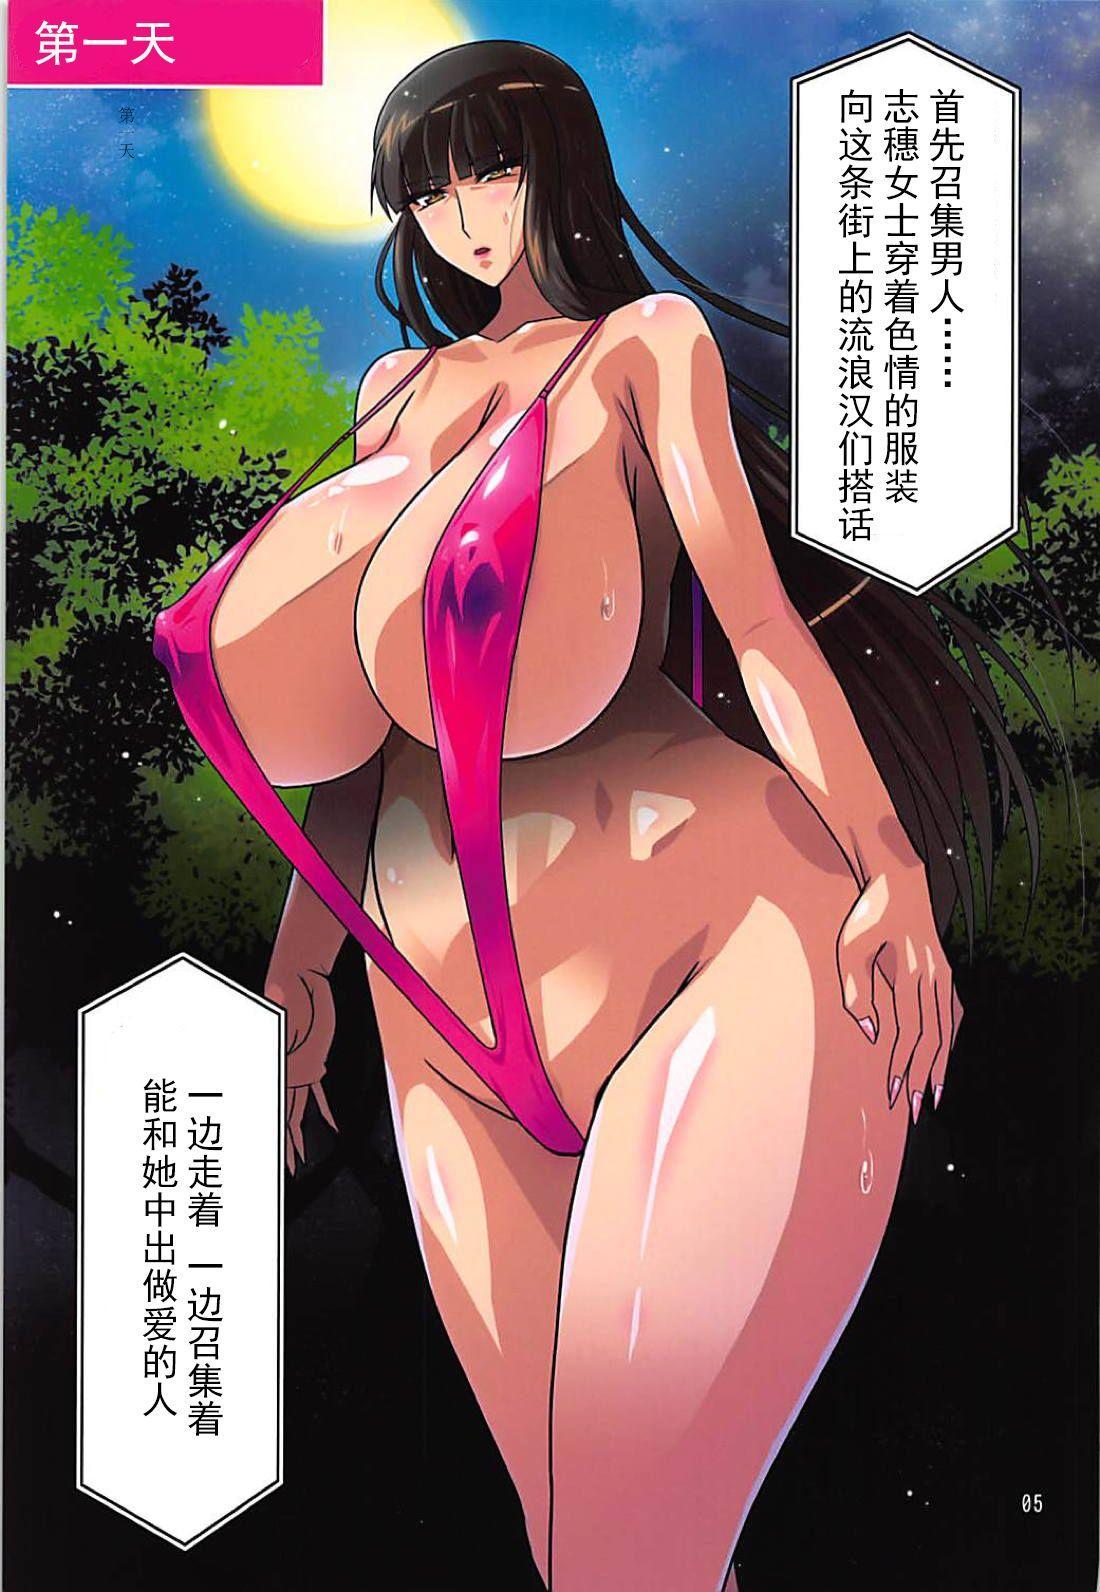 SHIHO 999 3